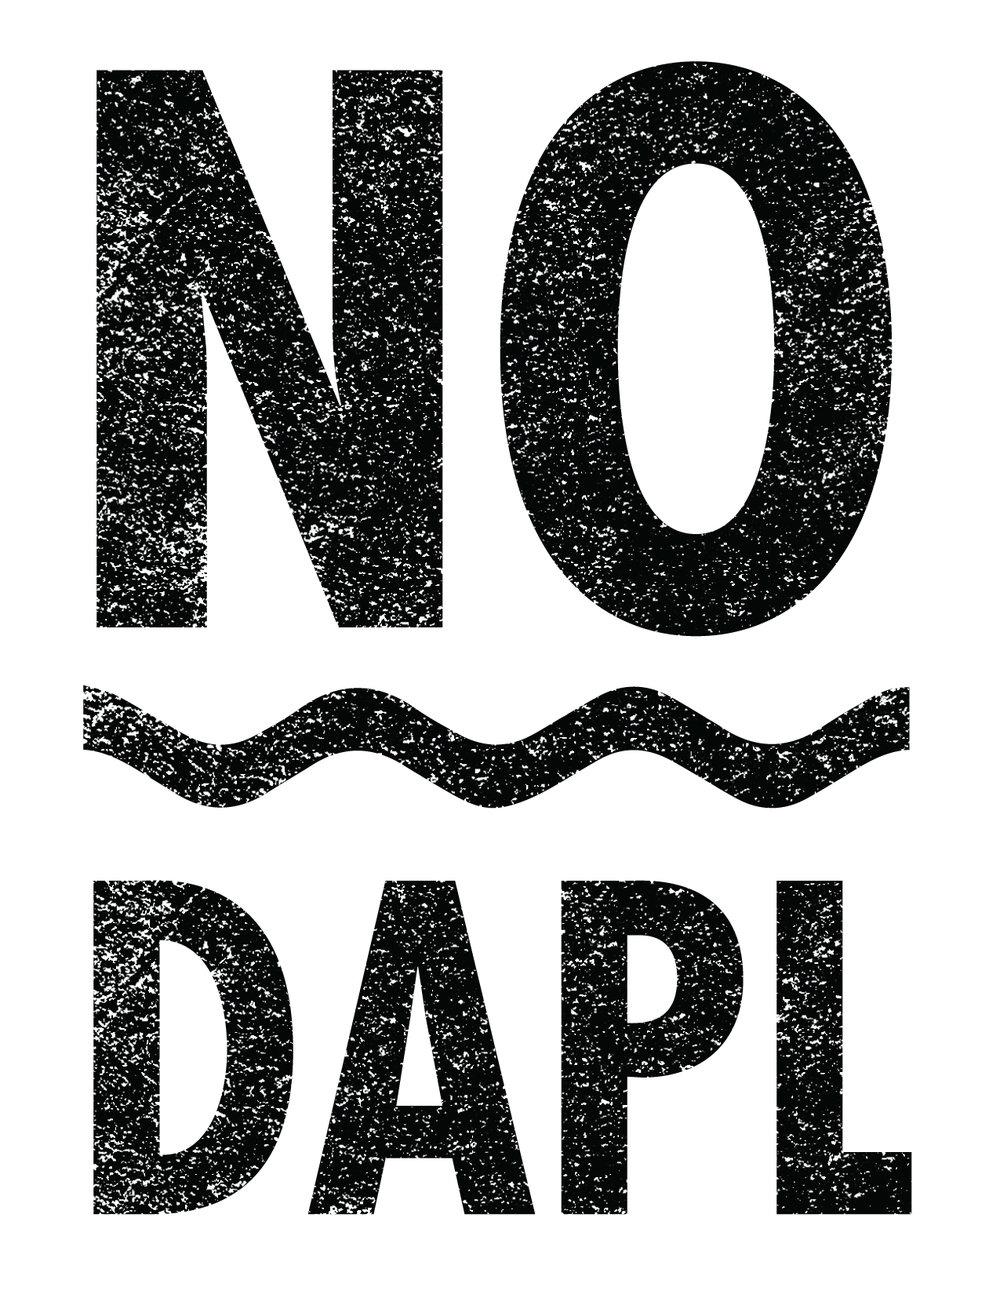 NODAPL-06.jpg